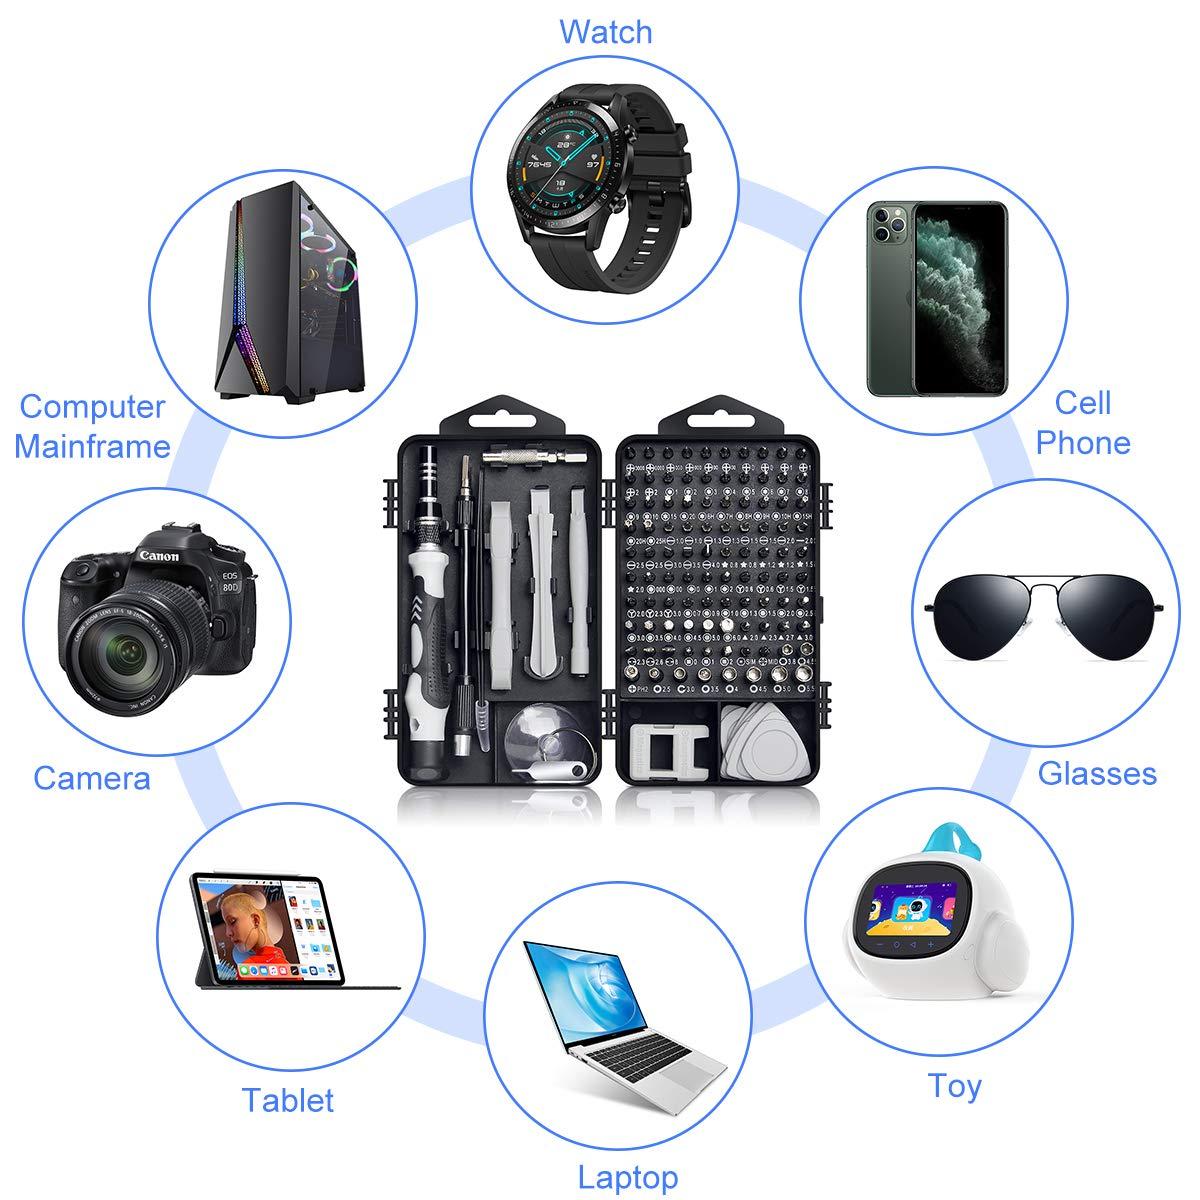 Tablet Kamera Infreecs 117 in 1 Reparatur Set Feinmechaniker Set Torx Bit Pr/äzisionsschraubendreher Set f/ür Smartphone Elektronik Set Konsolen Schraubendreher Set Feinmechanik Uhren PC